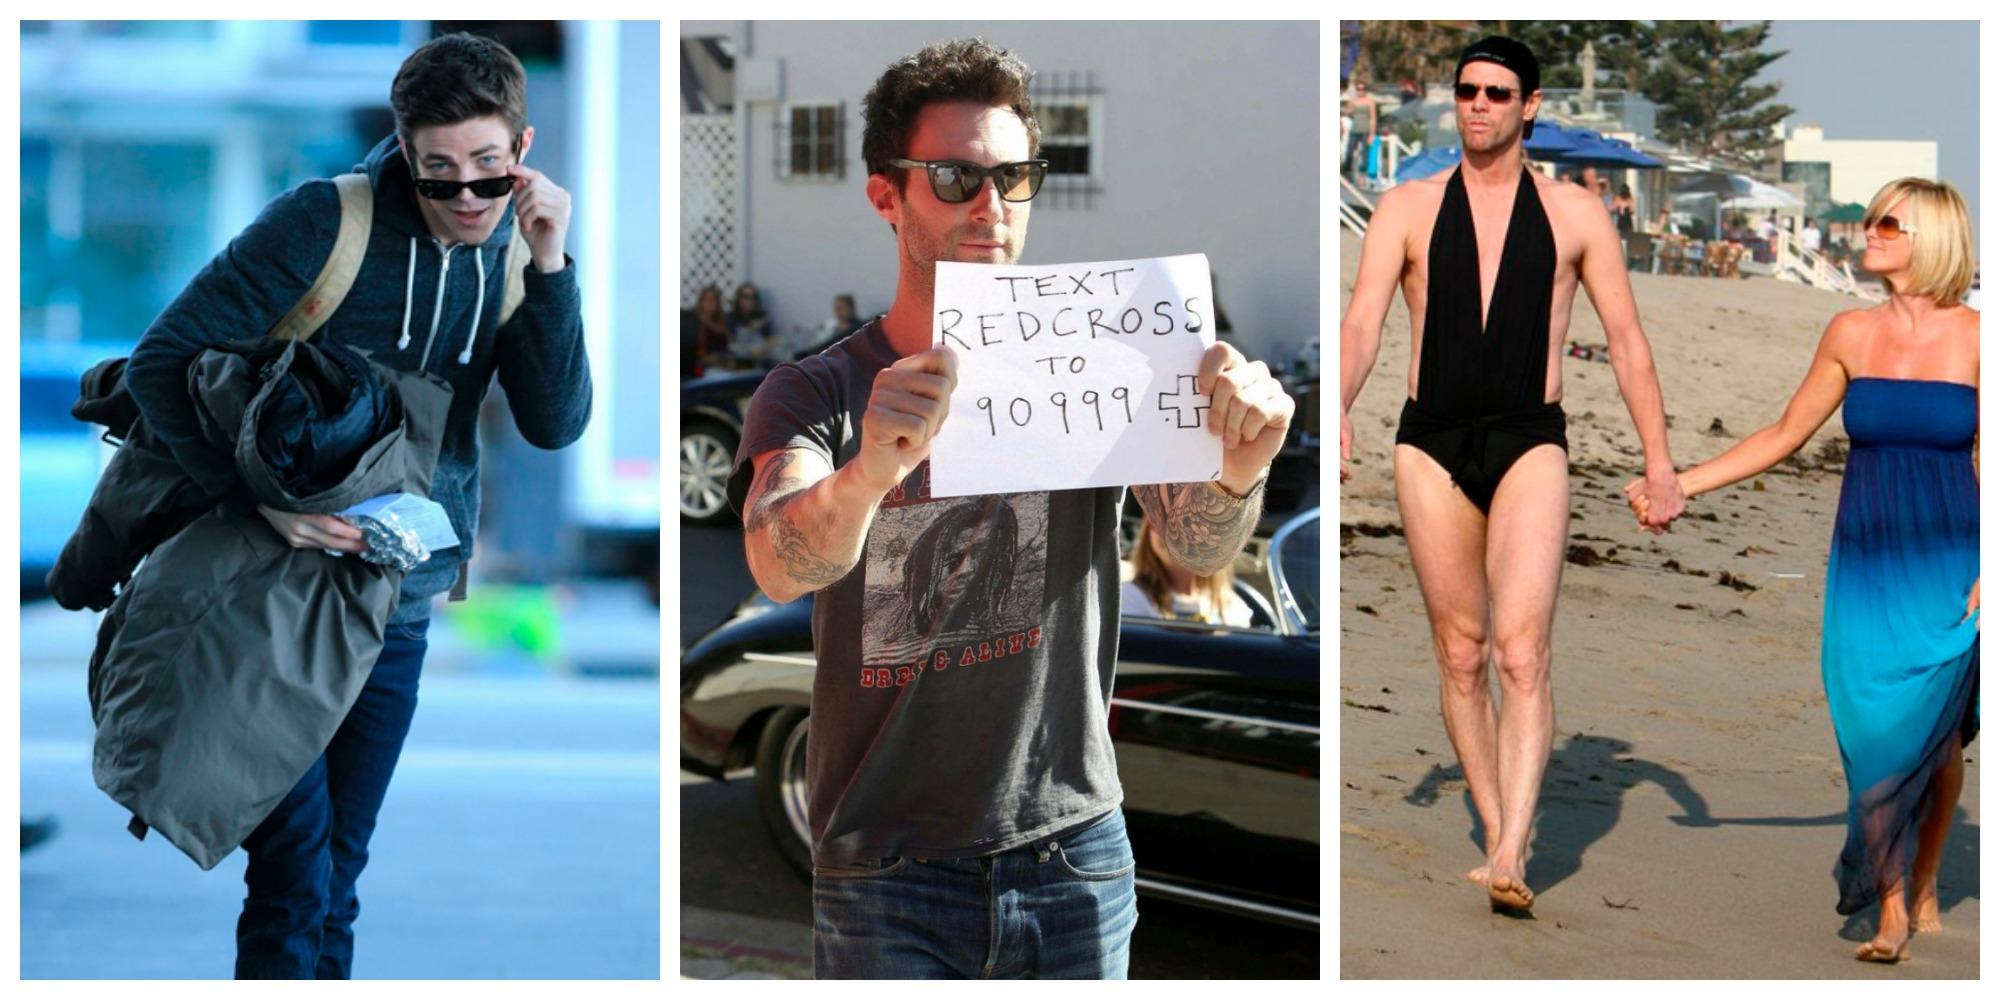 Paparazzi Paparazzi Celebrity nudes (77 photos), Ass, Bikini, Instagram, braless 2015